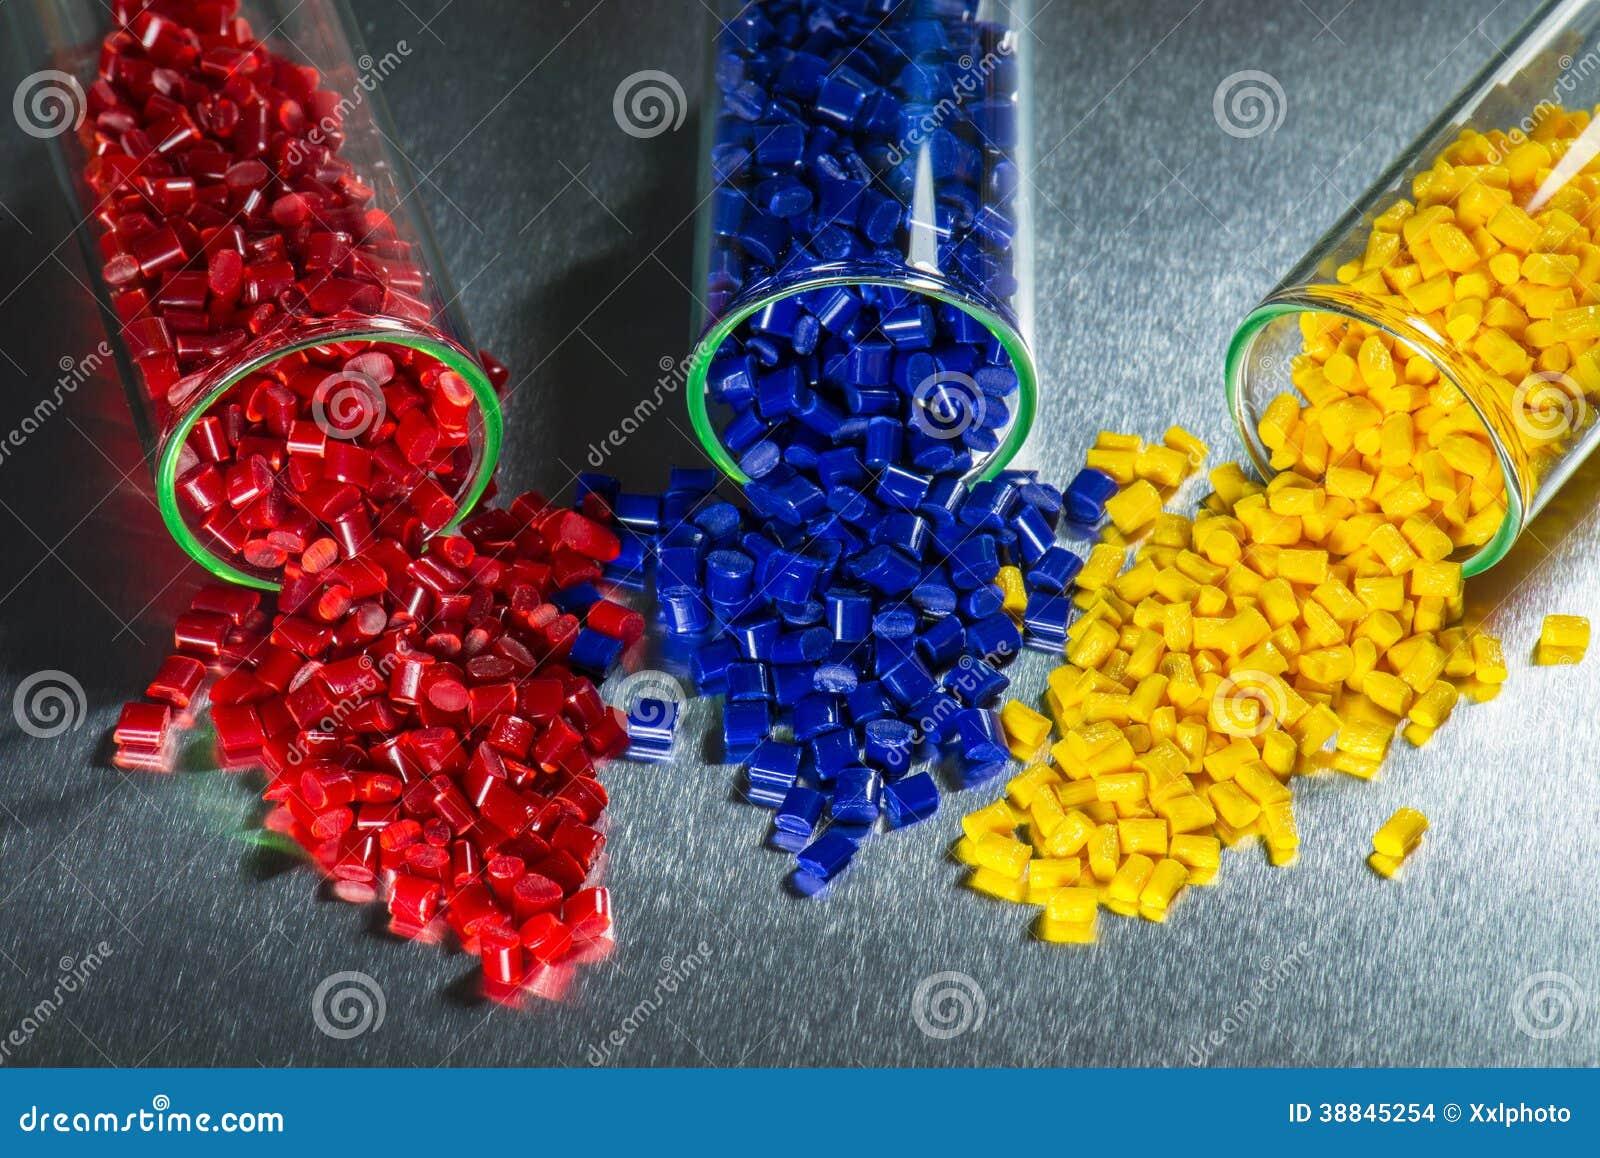 Dyed Plastic Resins Stock Photo Image 38845254